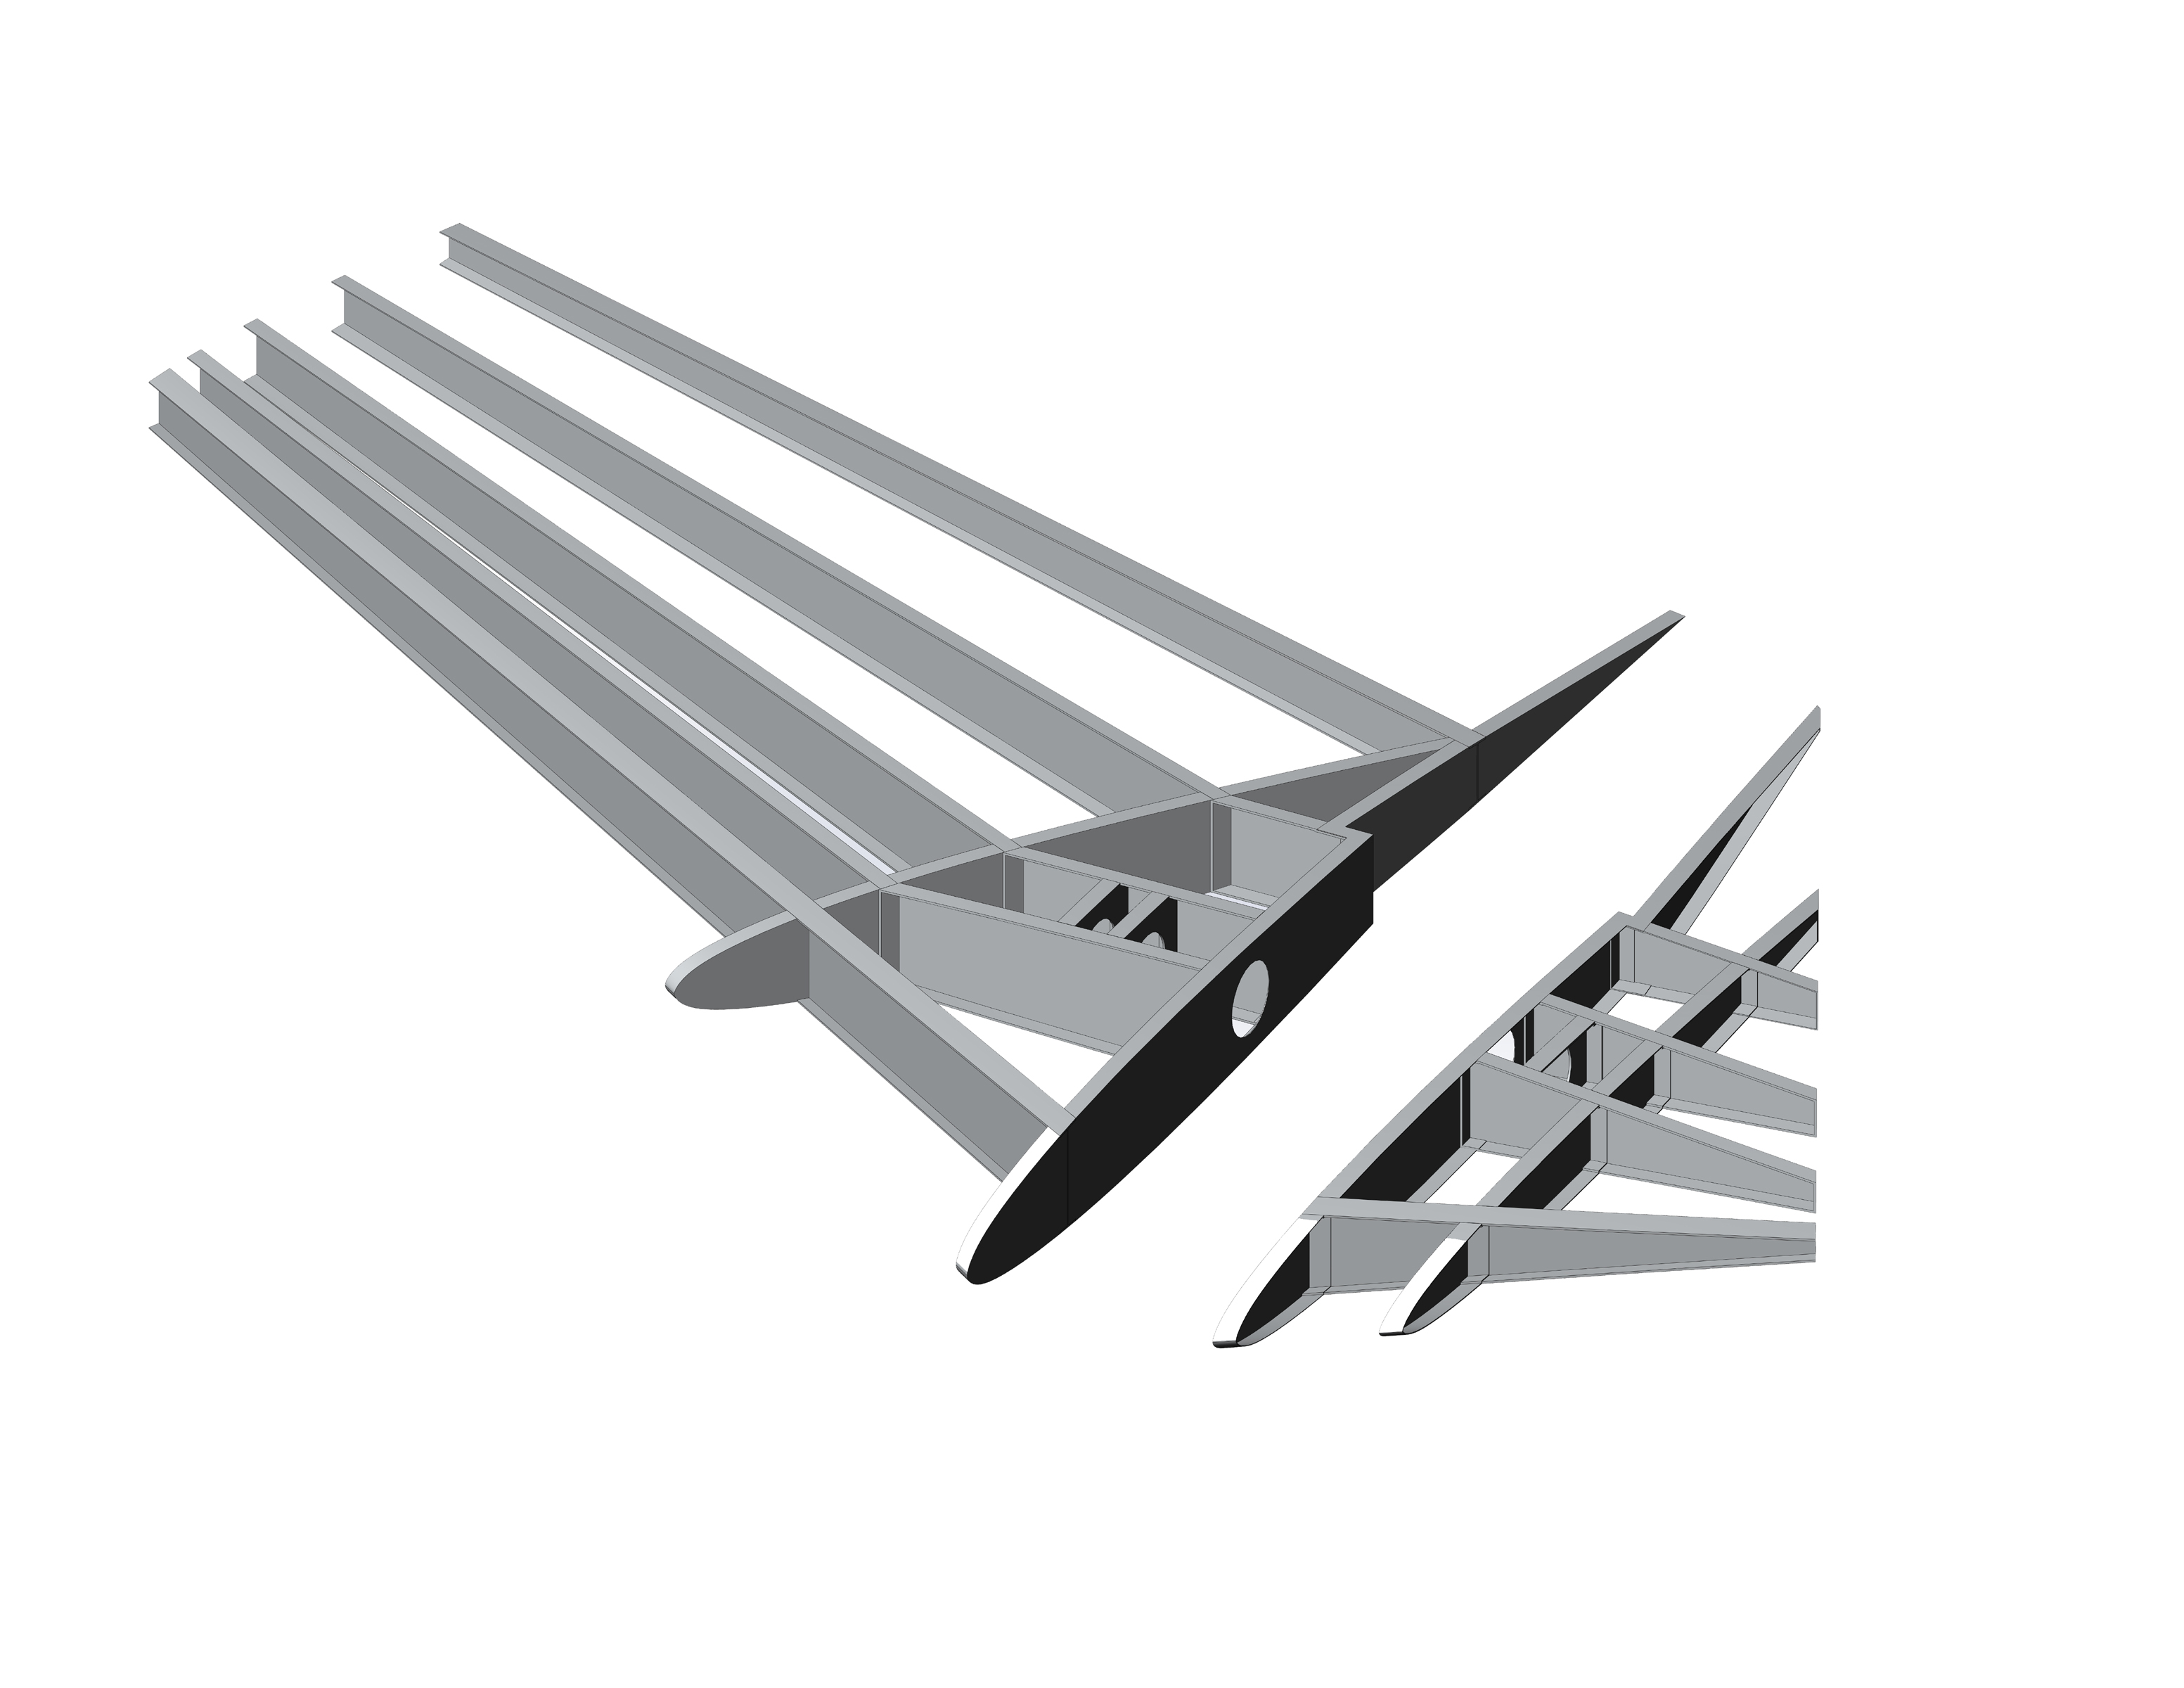 Stavatti, Stavatti Aerospace, SM-27, SM-27S, SM-27T, Machete, CAS, Horizontal Stabilizer, Tail